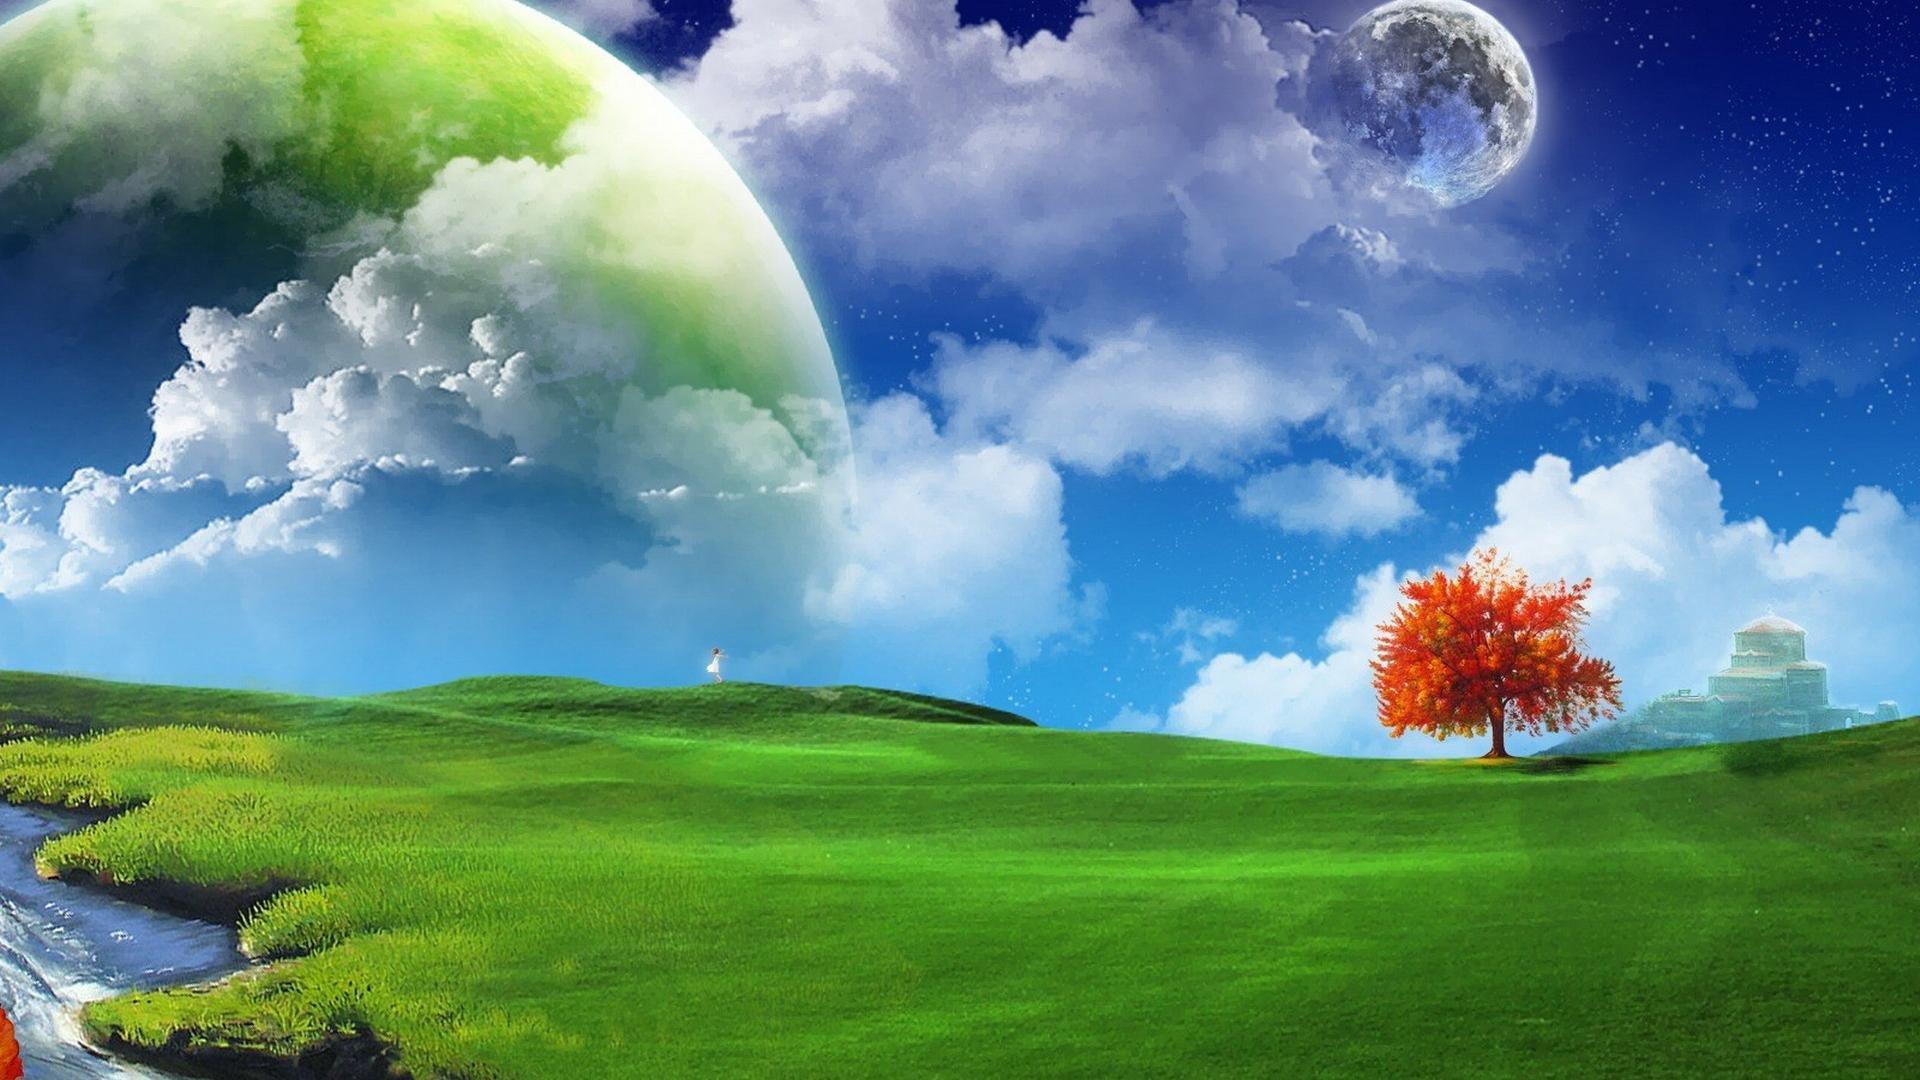 Beautiful Nature 15663 Hd Wallpaper